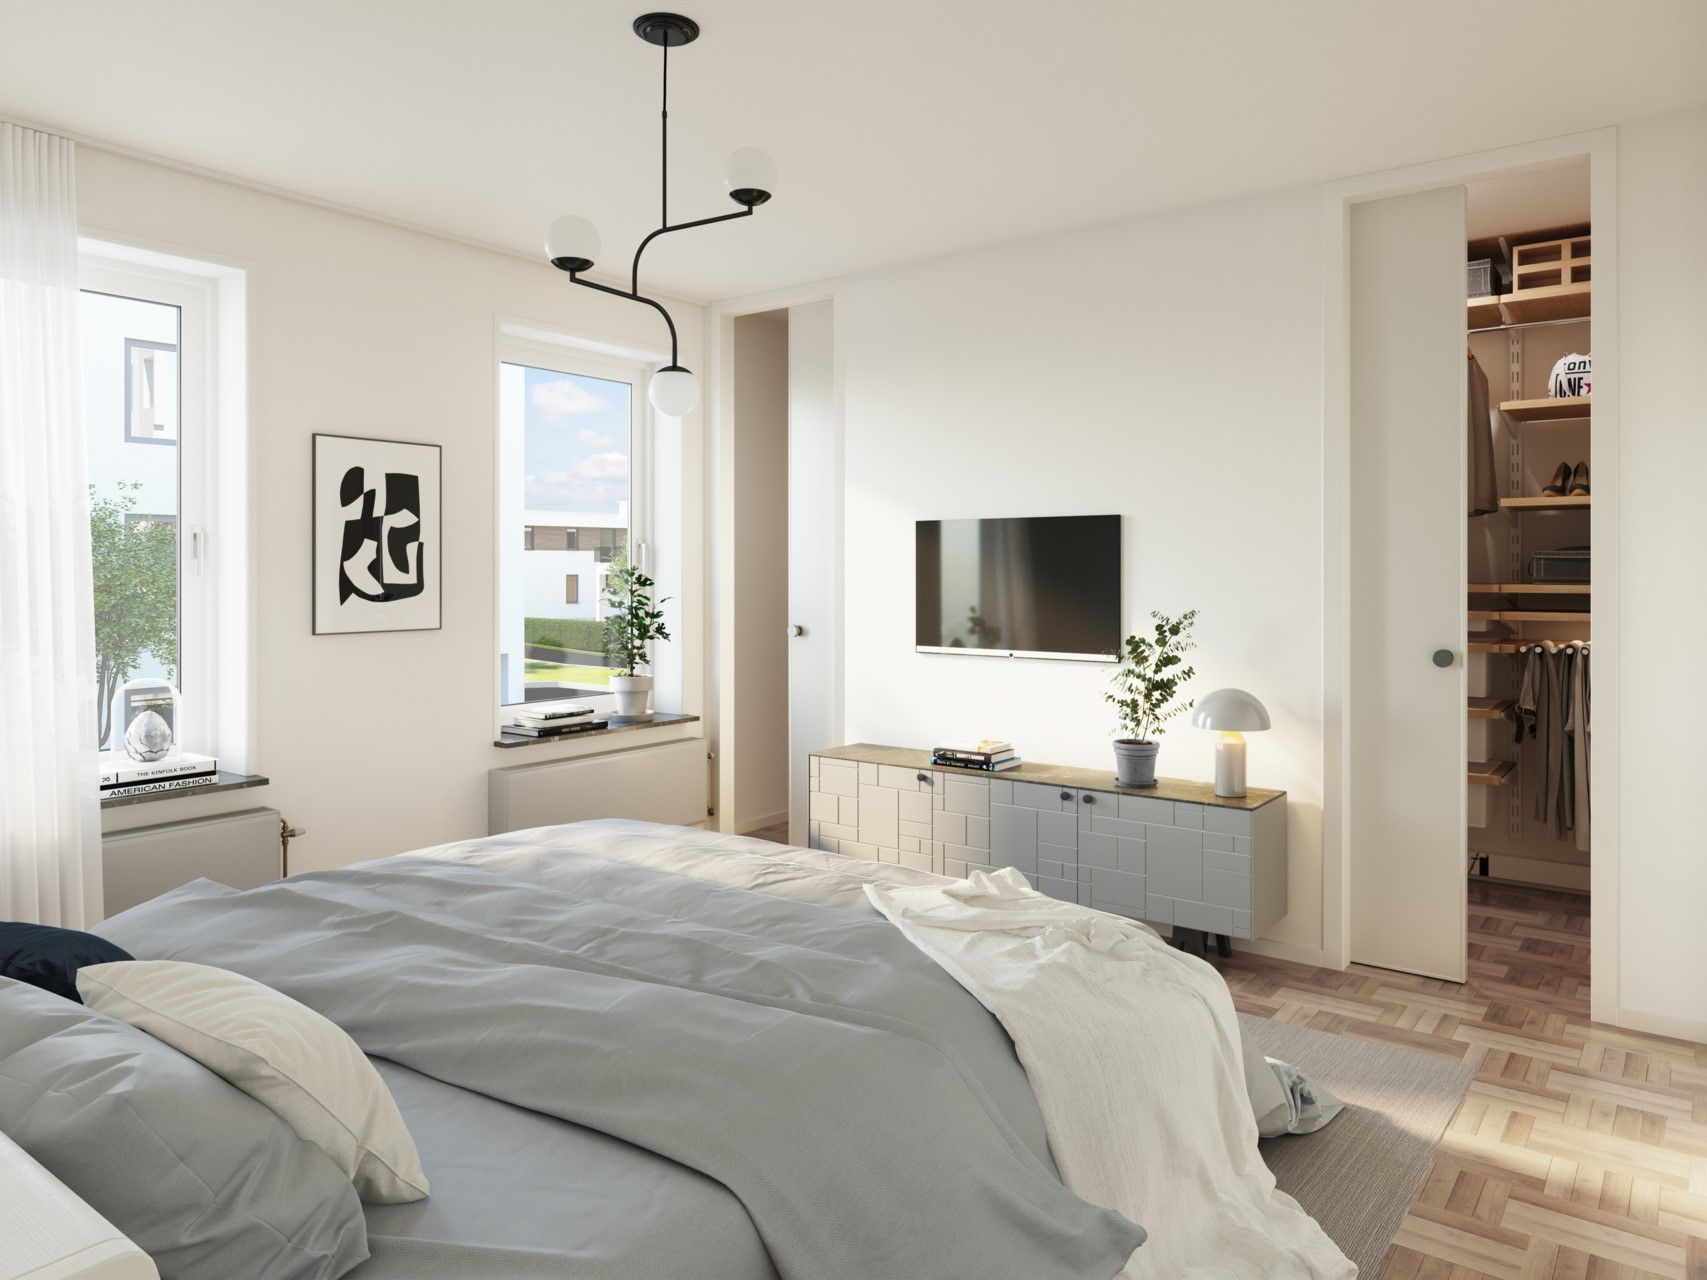 Sovrum, animerad exempelbild